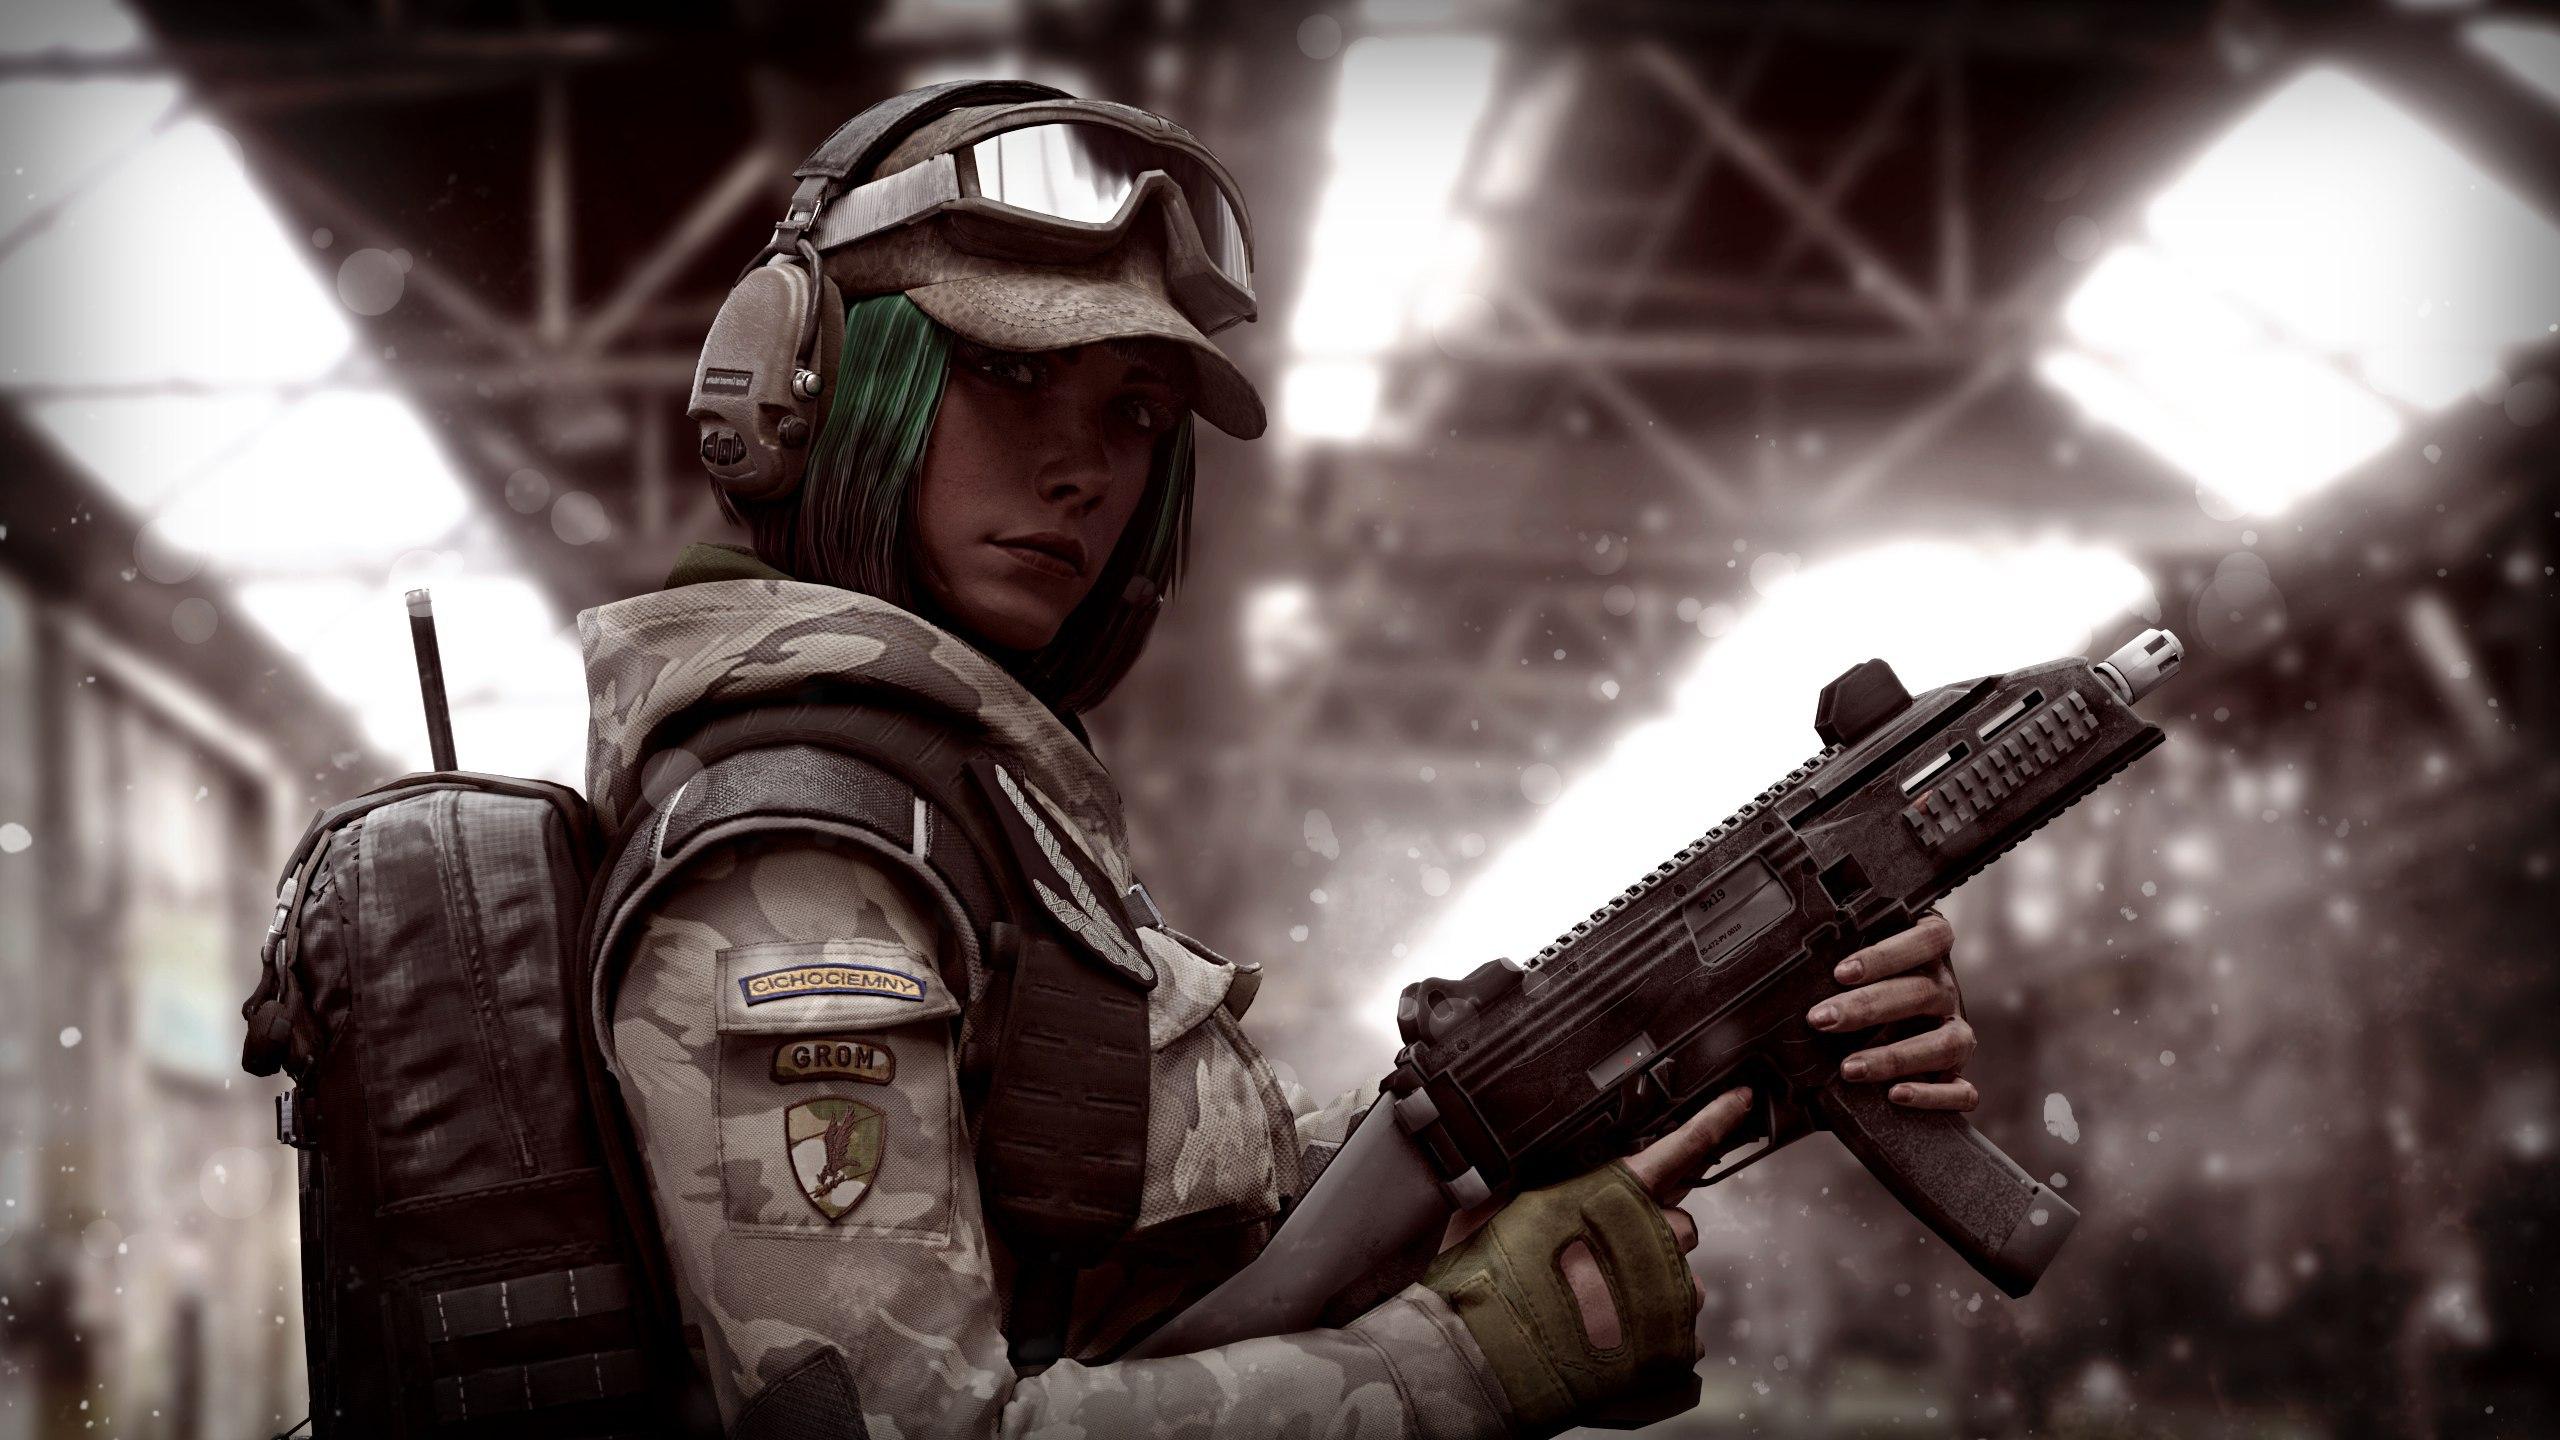 Rainbow Six Siege Wallpaper 4k: Ela R6 Tom Clancys Rainbow Six Siege, HD Games, 4k